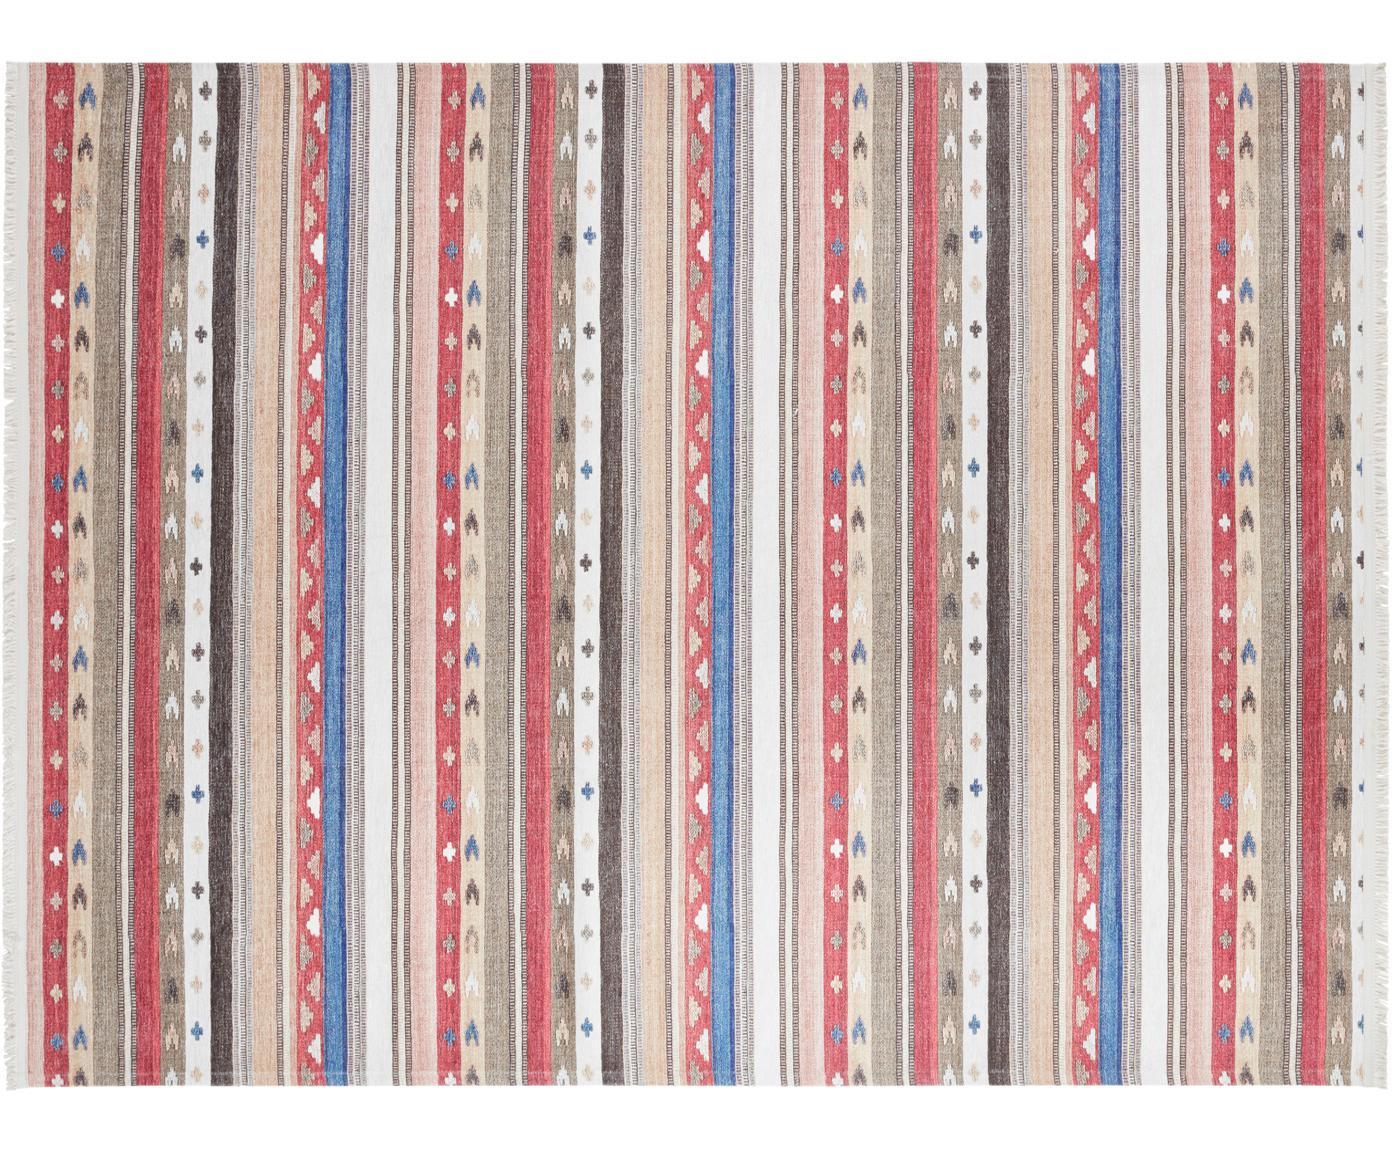 Vloerkleed Senon, 50% polyester, 50% katoen, Multicolour, 120 x 160 cm